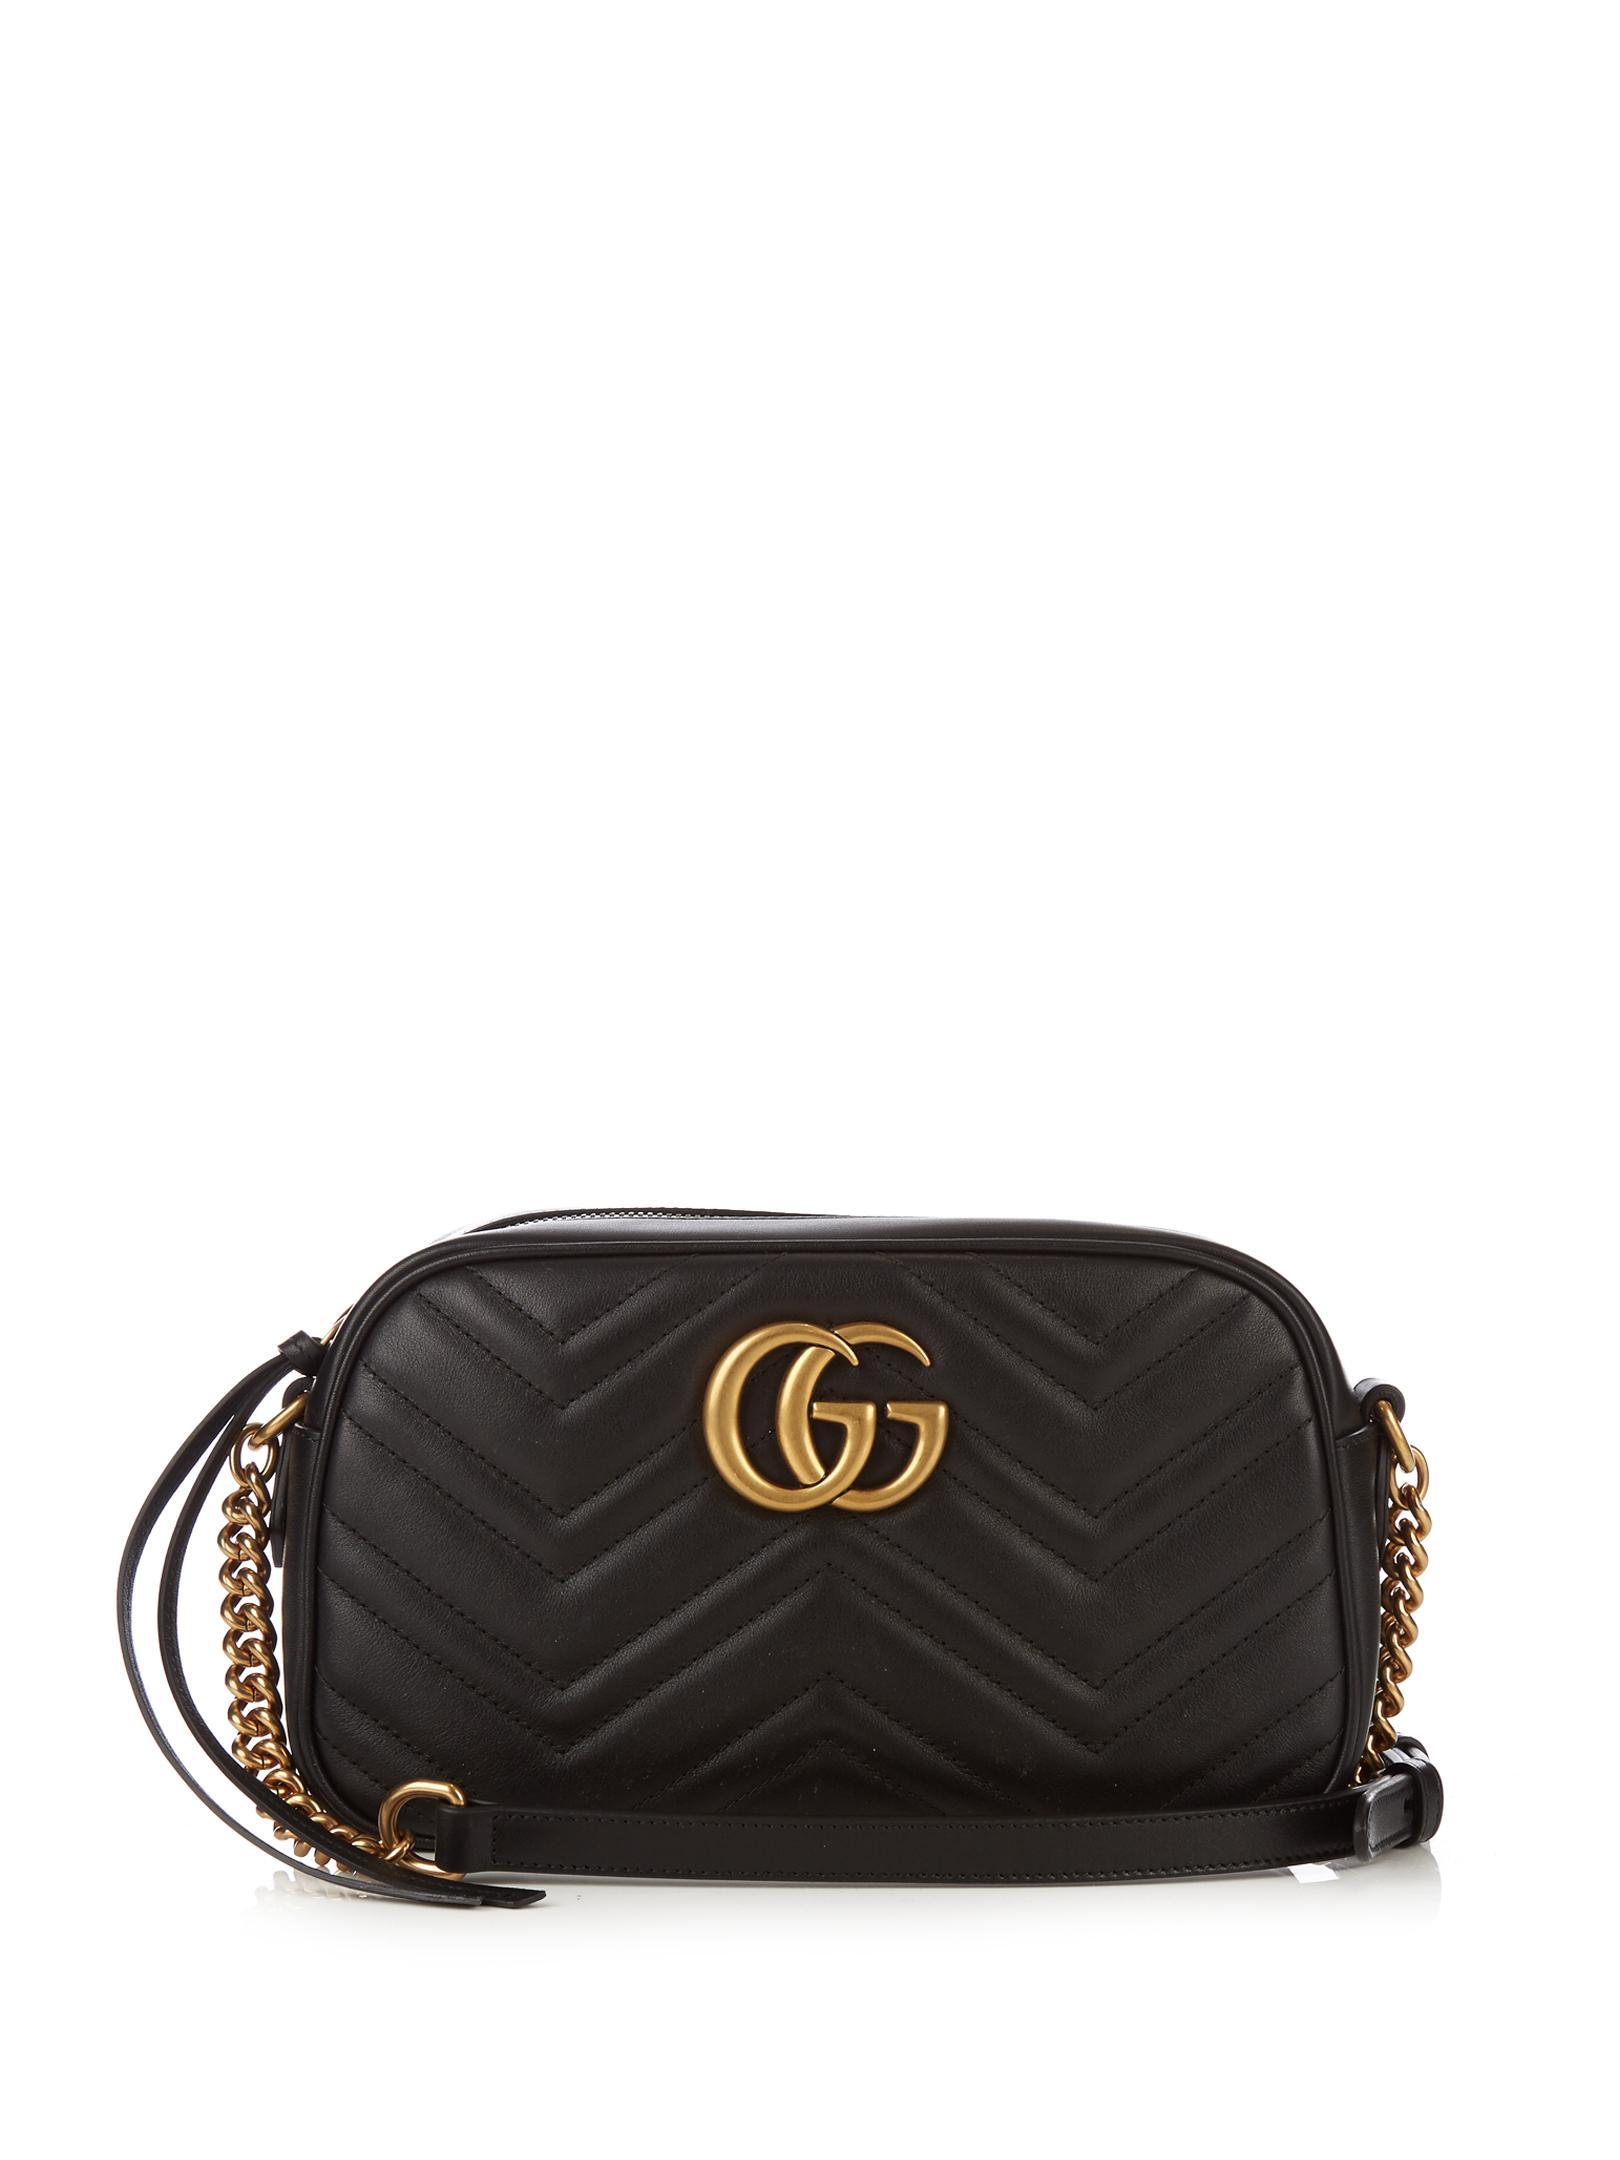 Gucci Gg Marmont Chevron Leather Cross Body Bag In Black